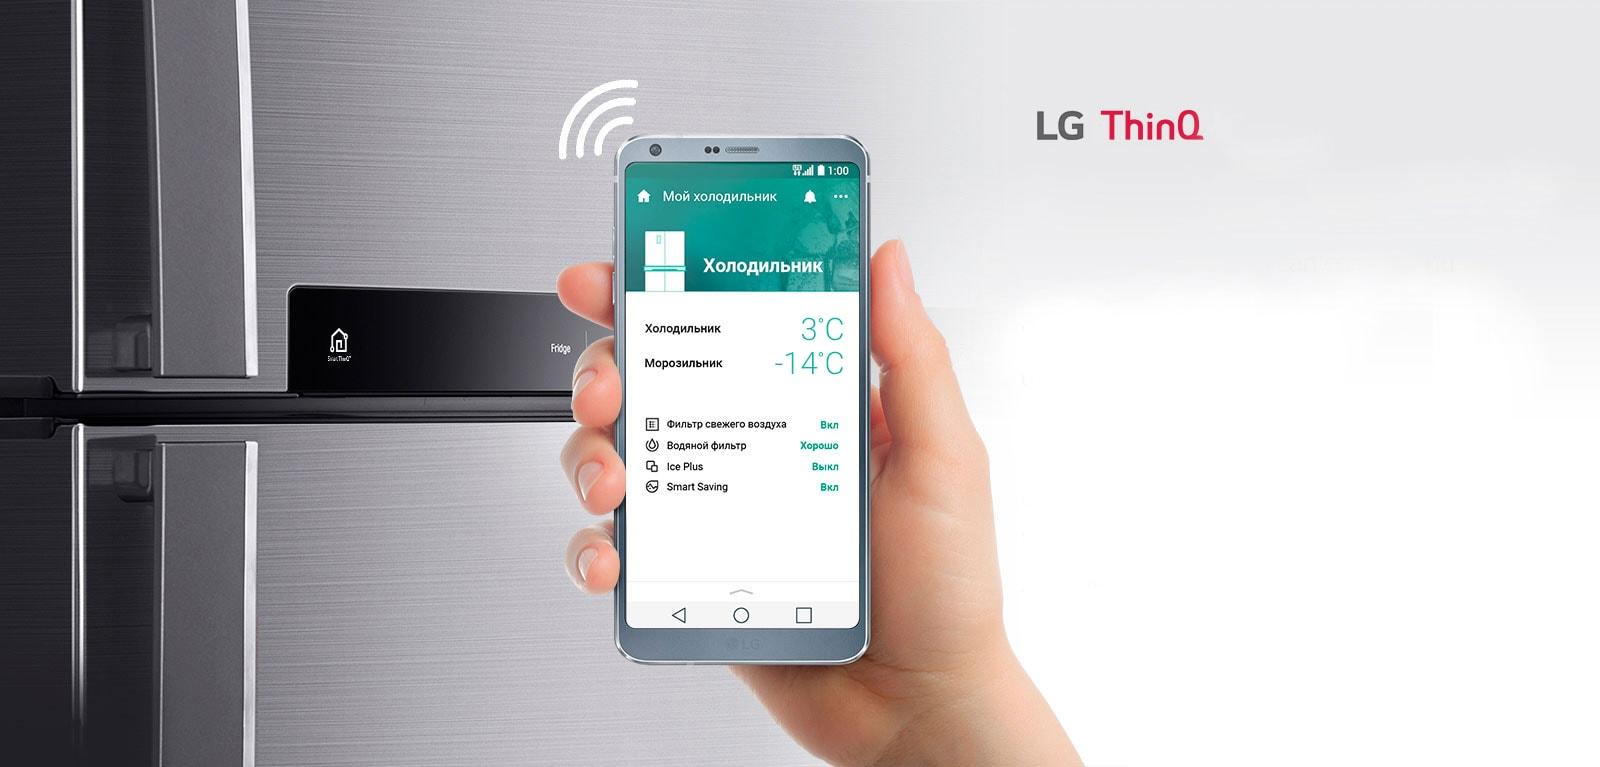 LG SmartThinQ